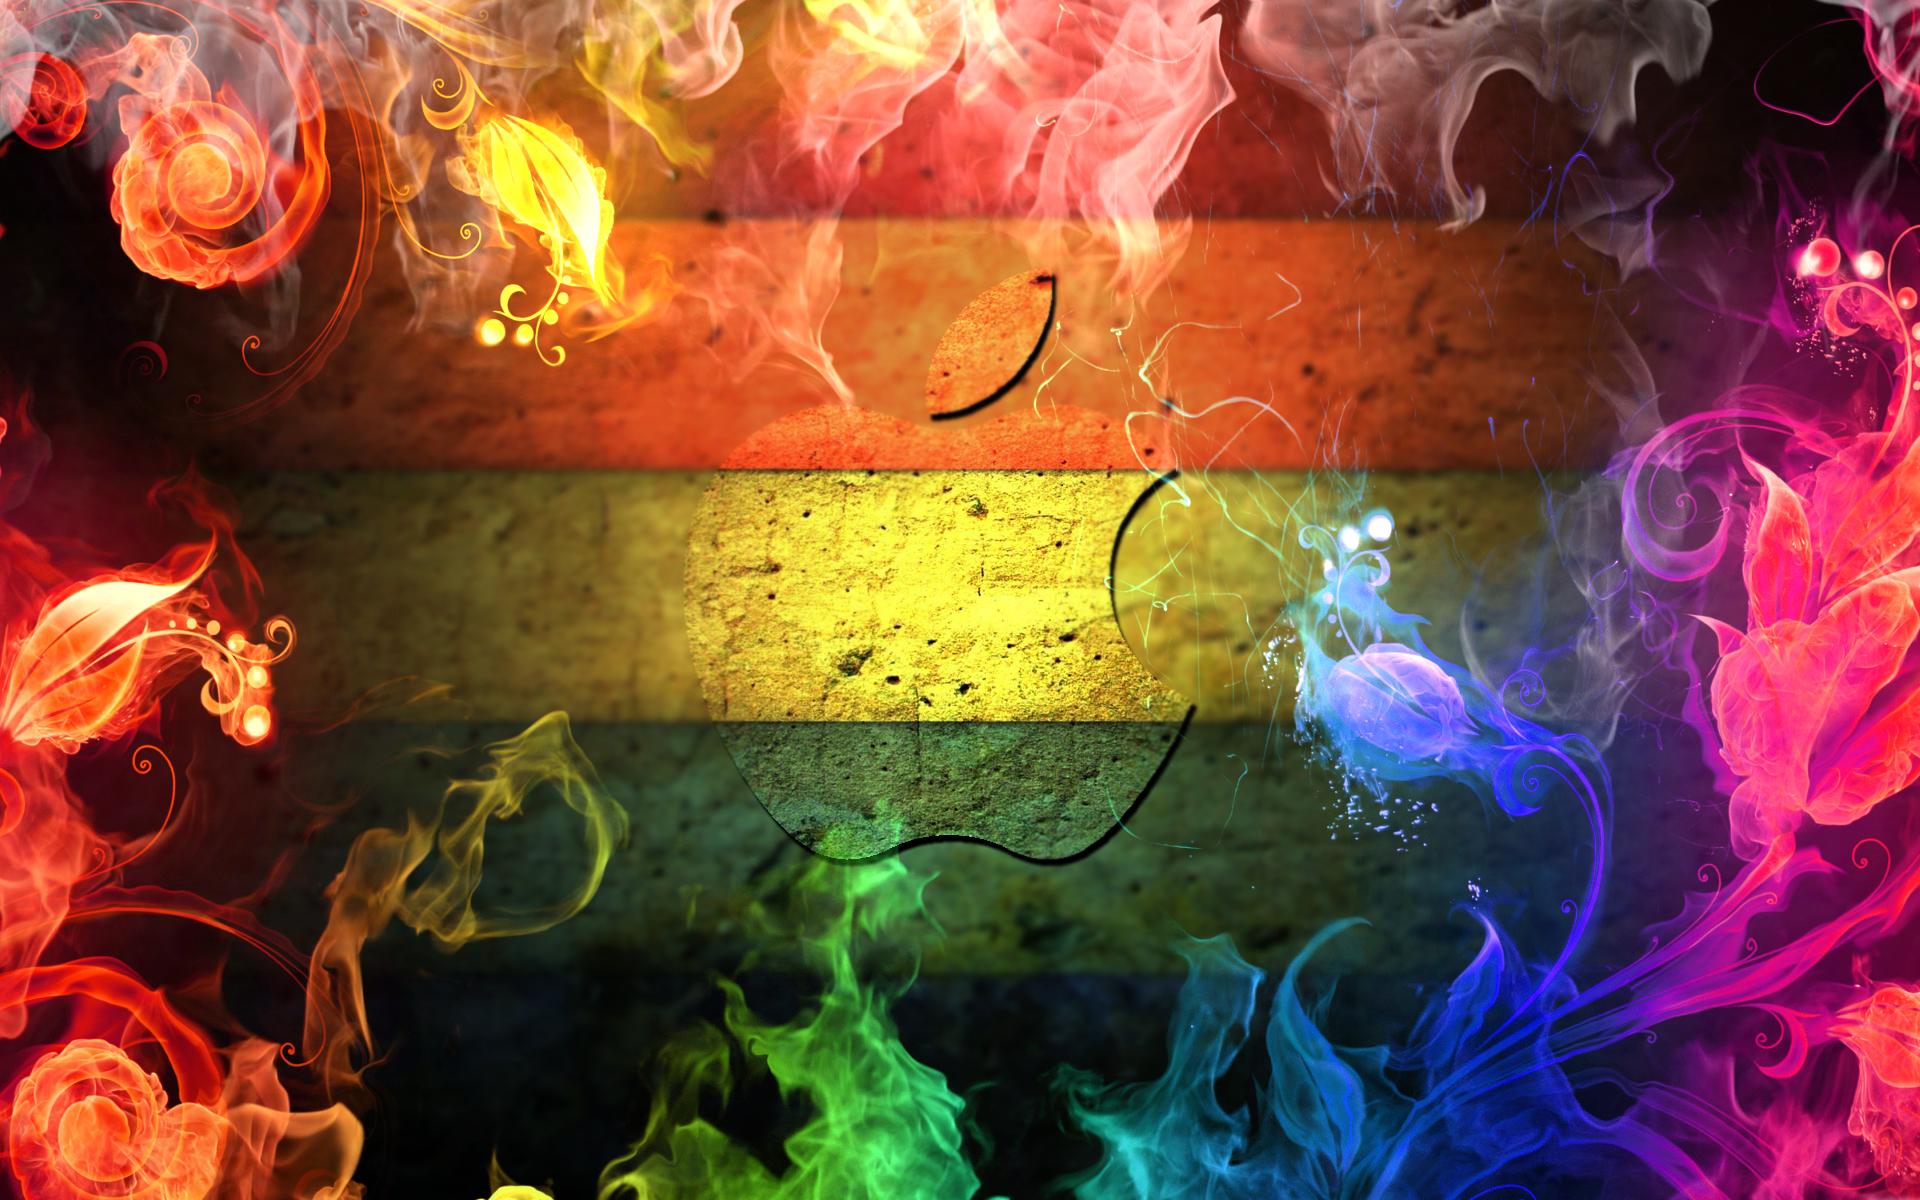 Colorful Desktop Wallpaper HD Wallpapers Download 1920x1200